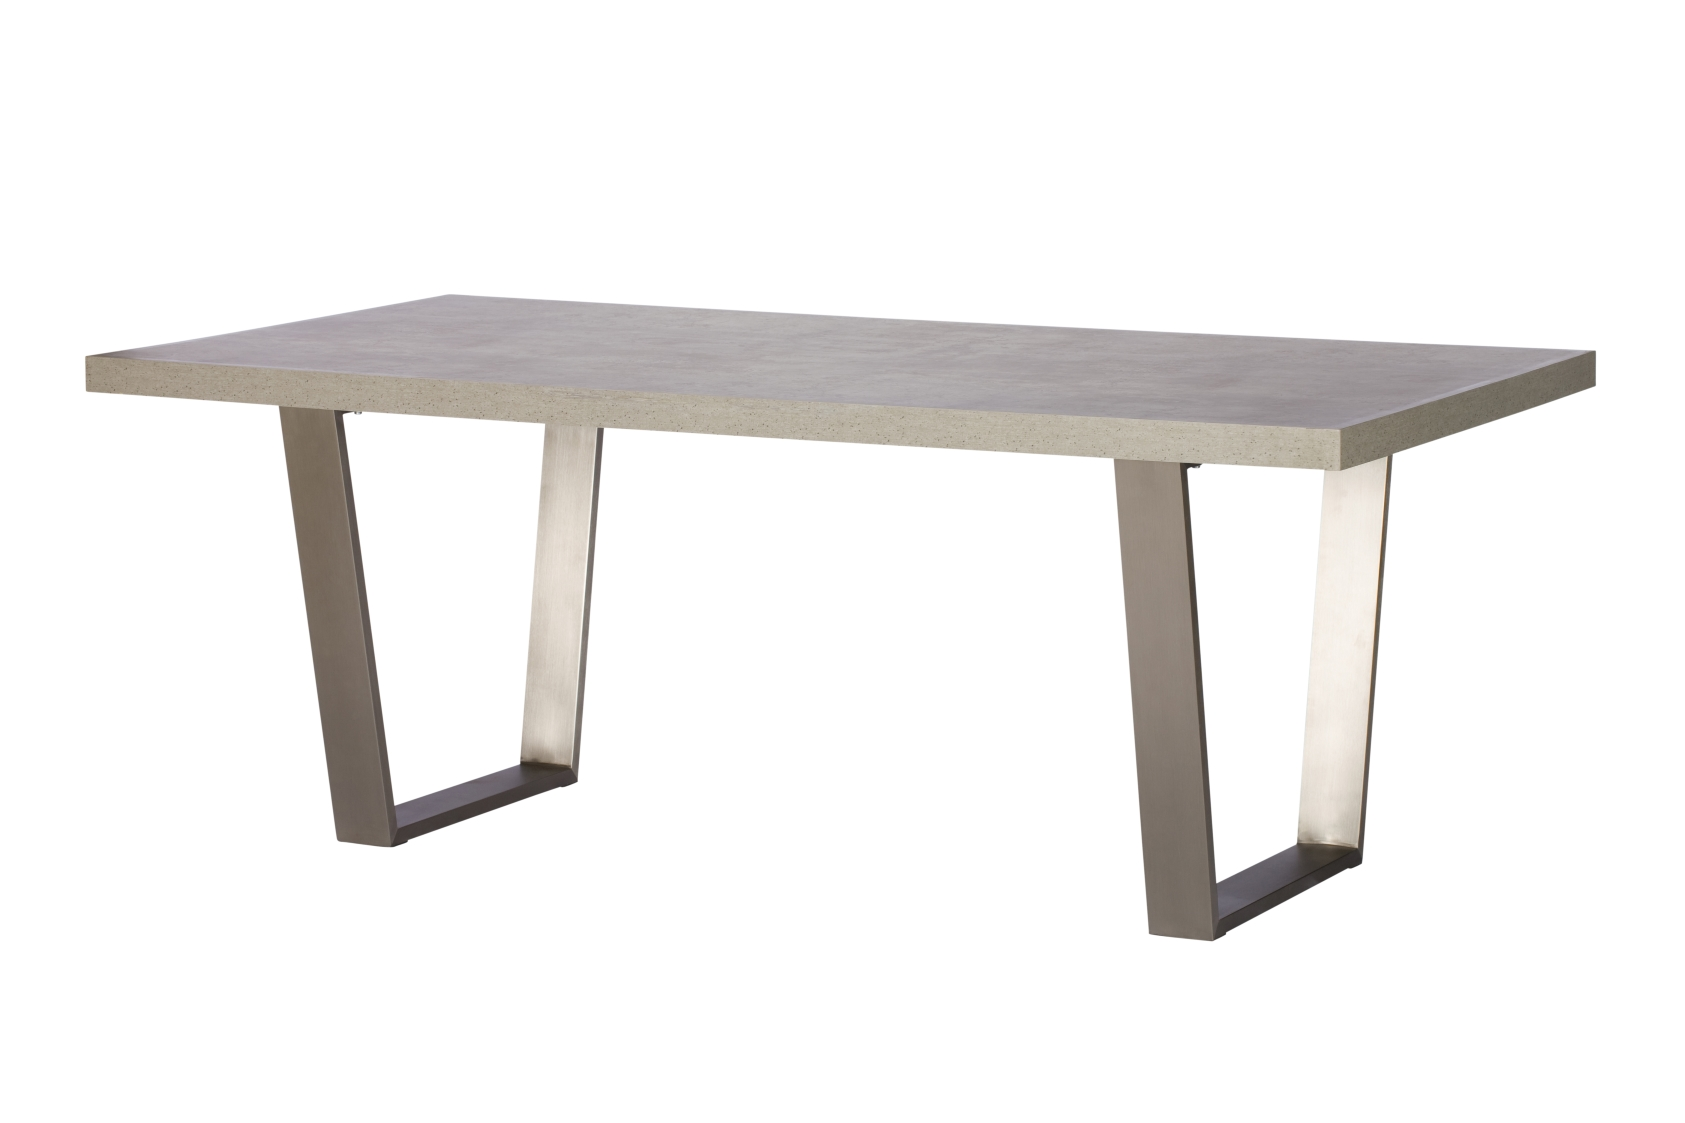 Pella Concrete Effect 200cm Dining Table